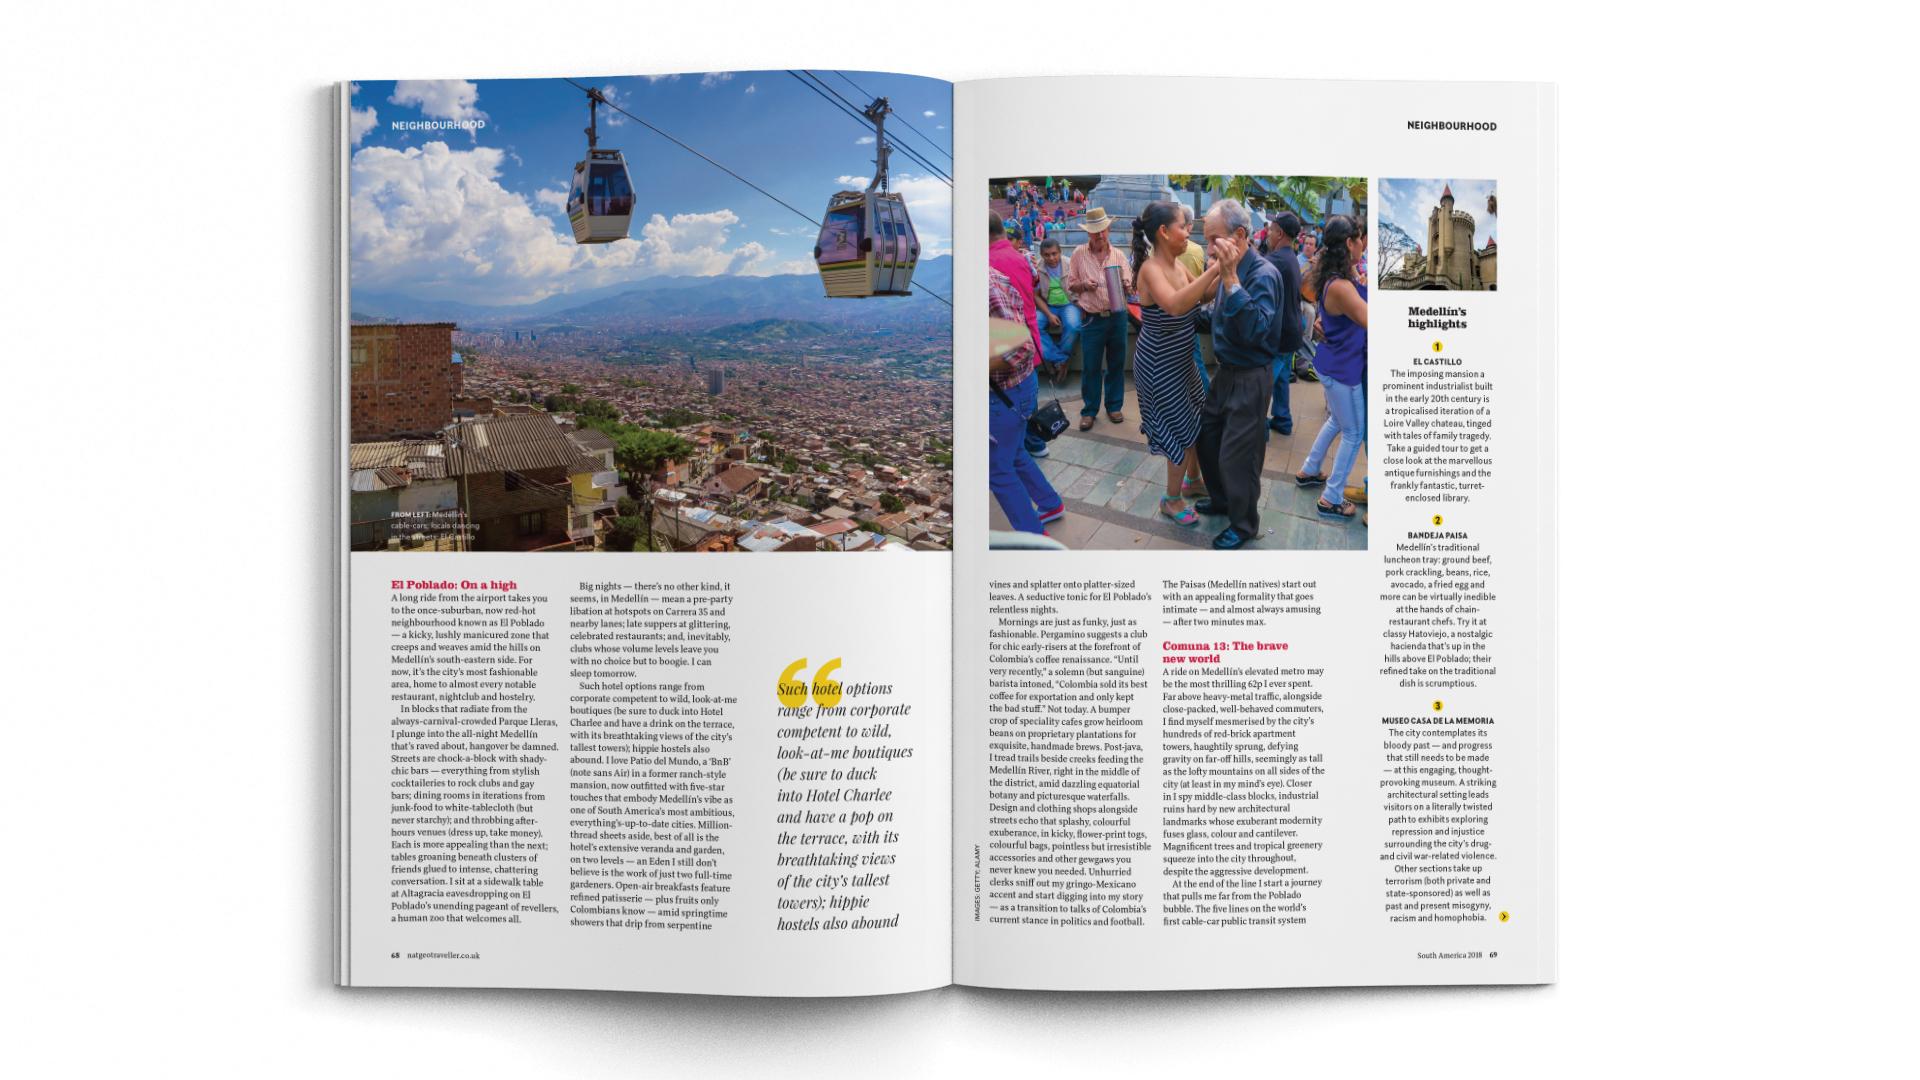 A4-Magazine-DPS-NGT-SA-Neighbourhood-Medellin-2